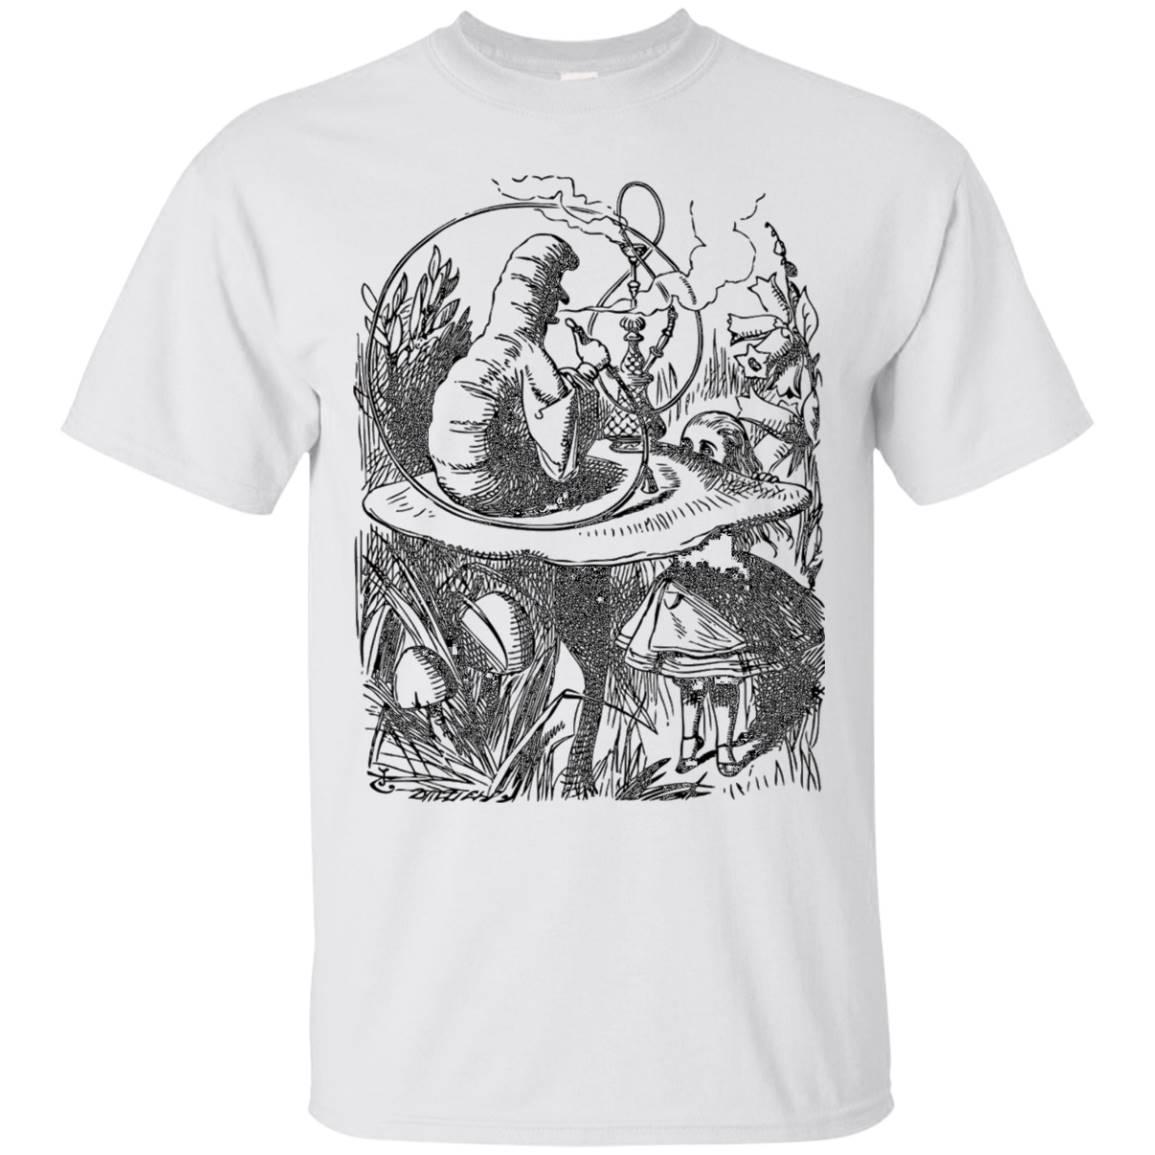 Big Texas Alice in Wonderland – Smoking Caterpillar T-Shirt